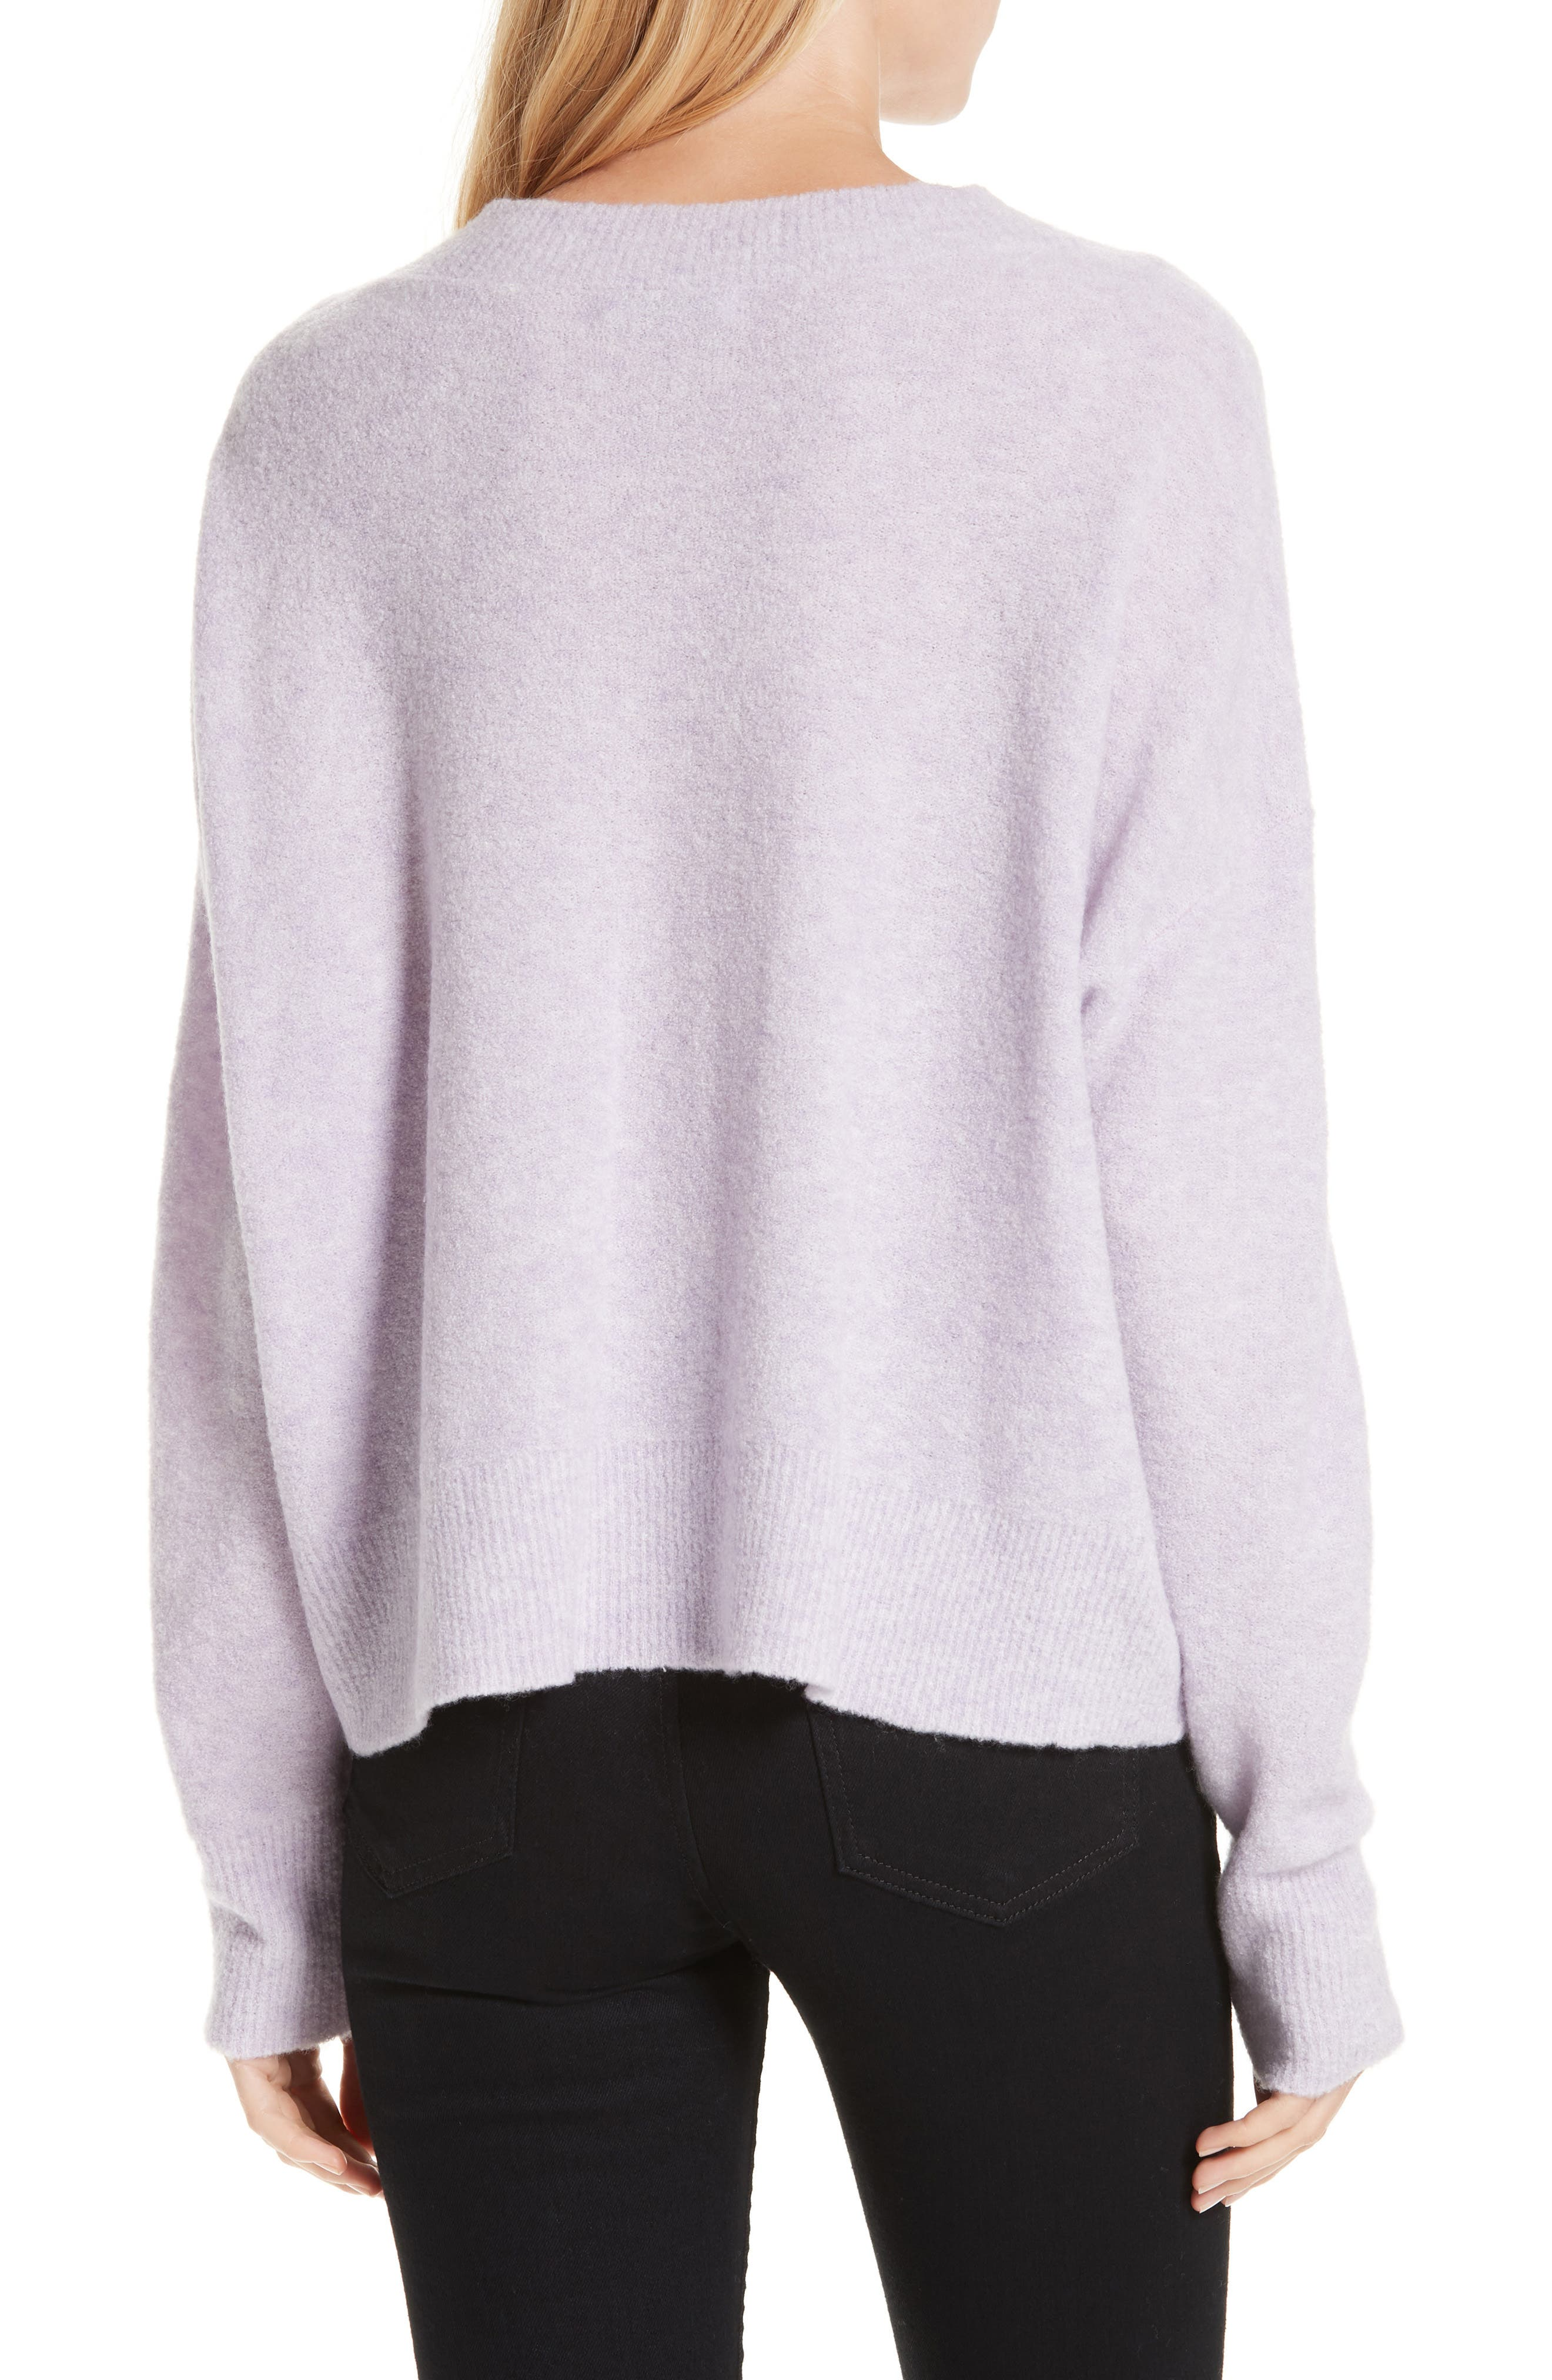 Cashmere Blend Bouclé Sweater,                             Alternate thumbnail 2, color,                             PURPLE HEIRLOOM HEATHER